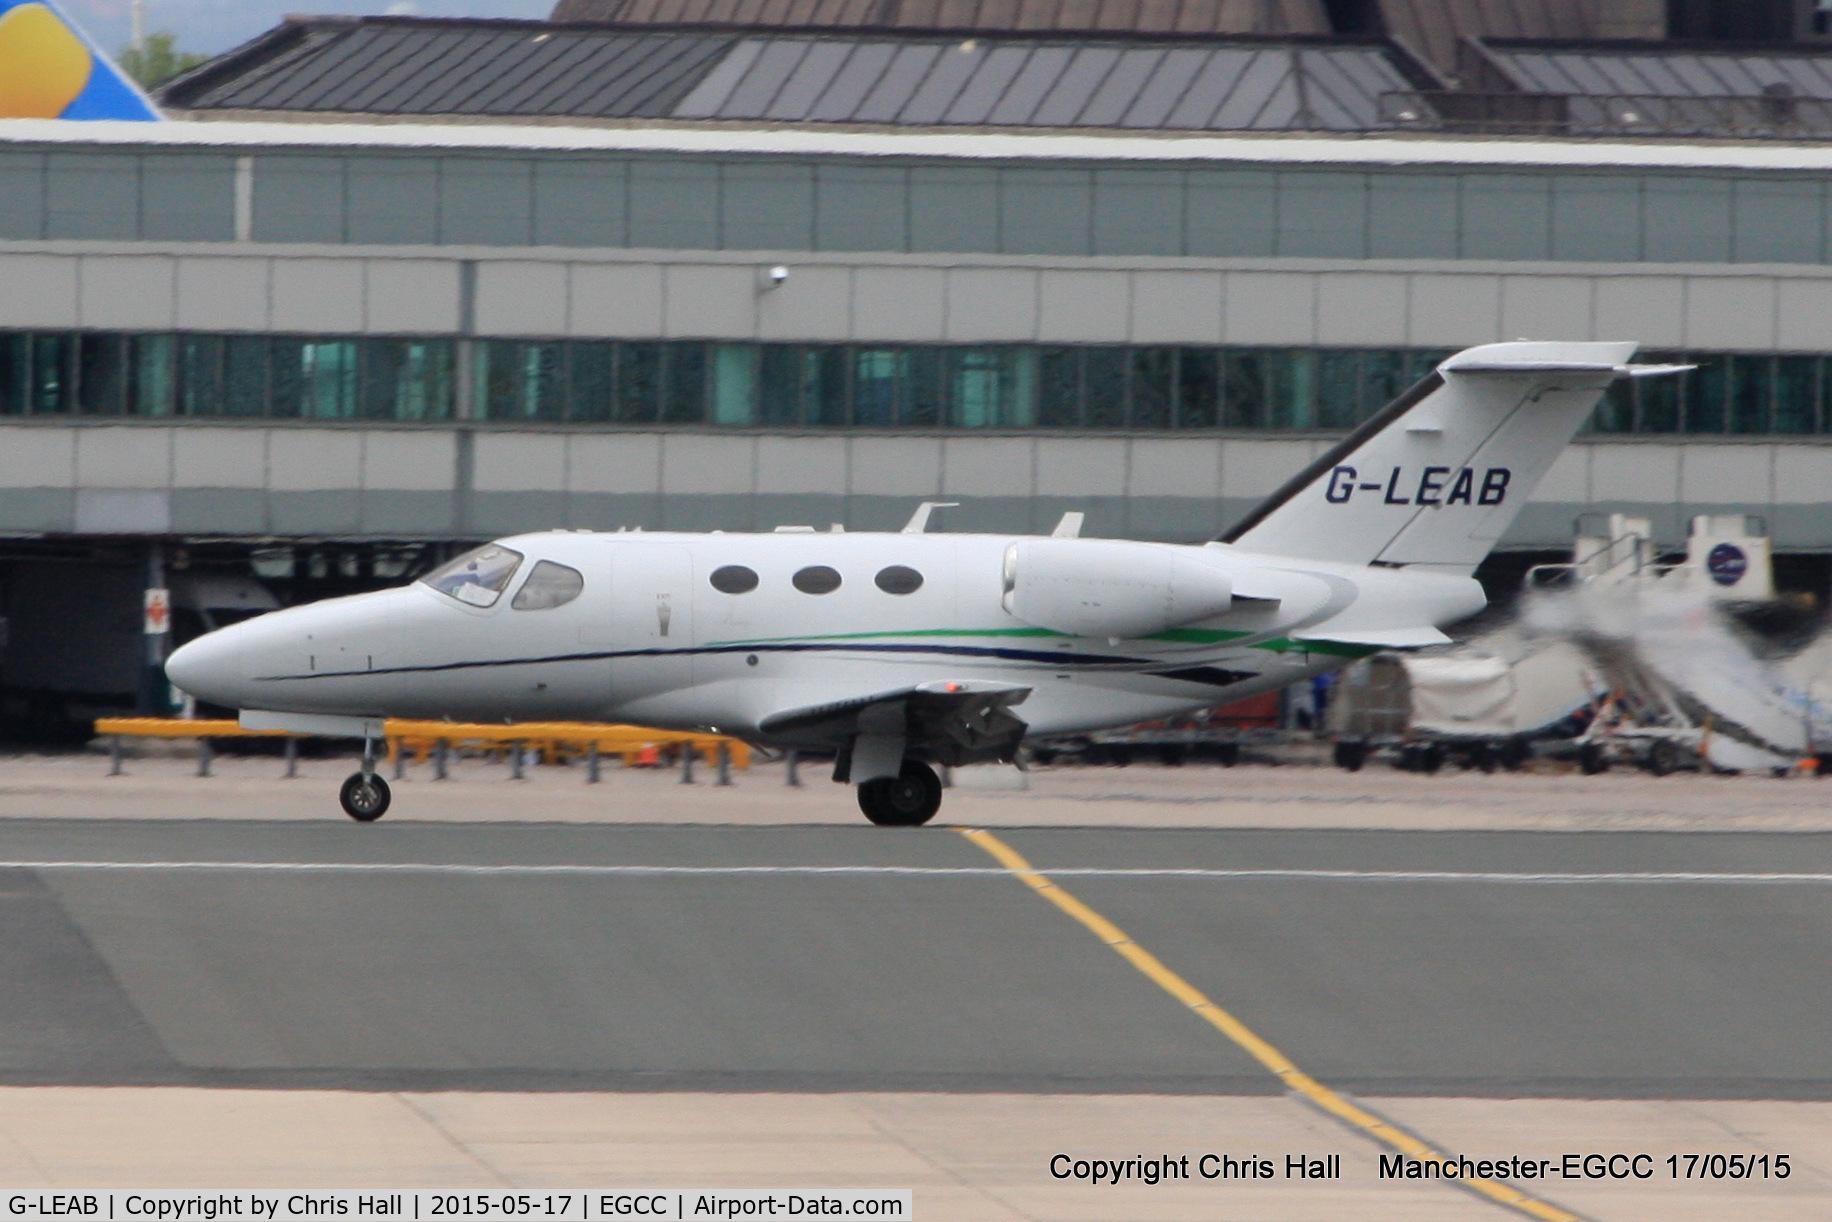 G-LEAB, 2008 Cessna 510 Citation Mustang Citation Mustang C/N 510-0073, London Executive Aviation